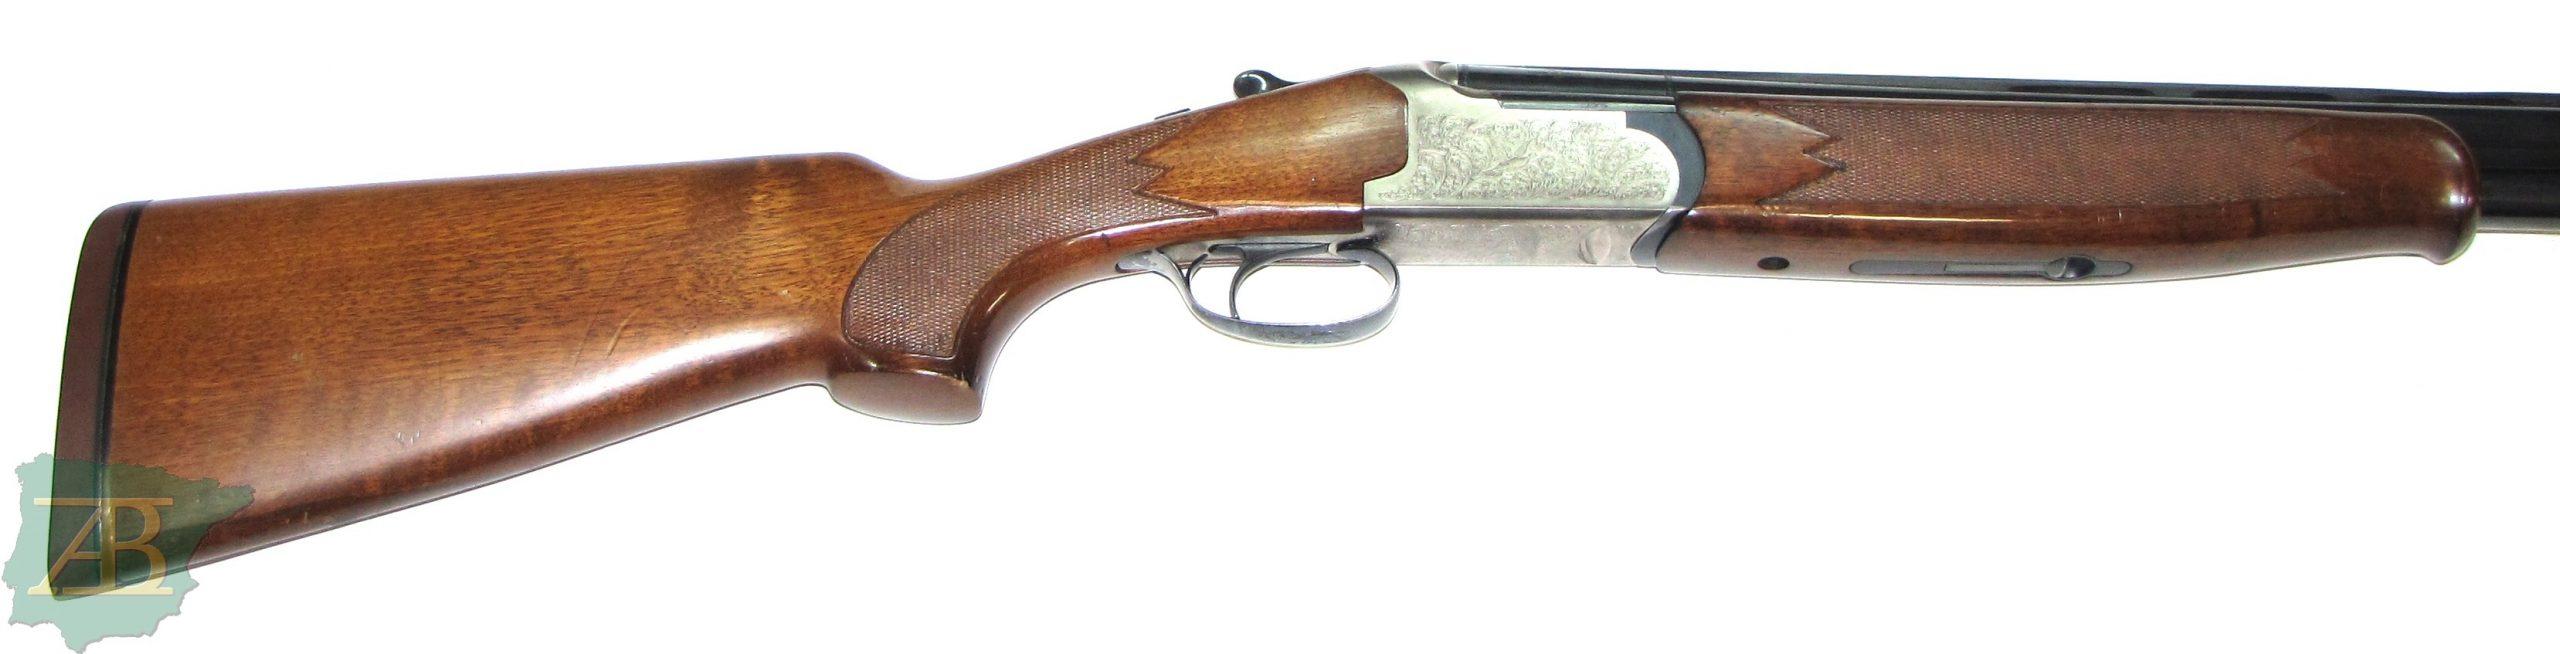 Escopeta superpuesta de caza LANBER Ref 5532-armeriaiberica-2